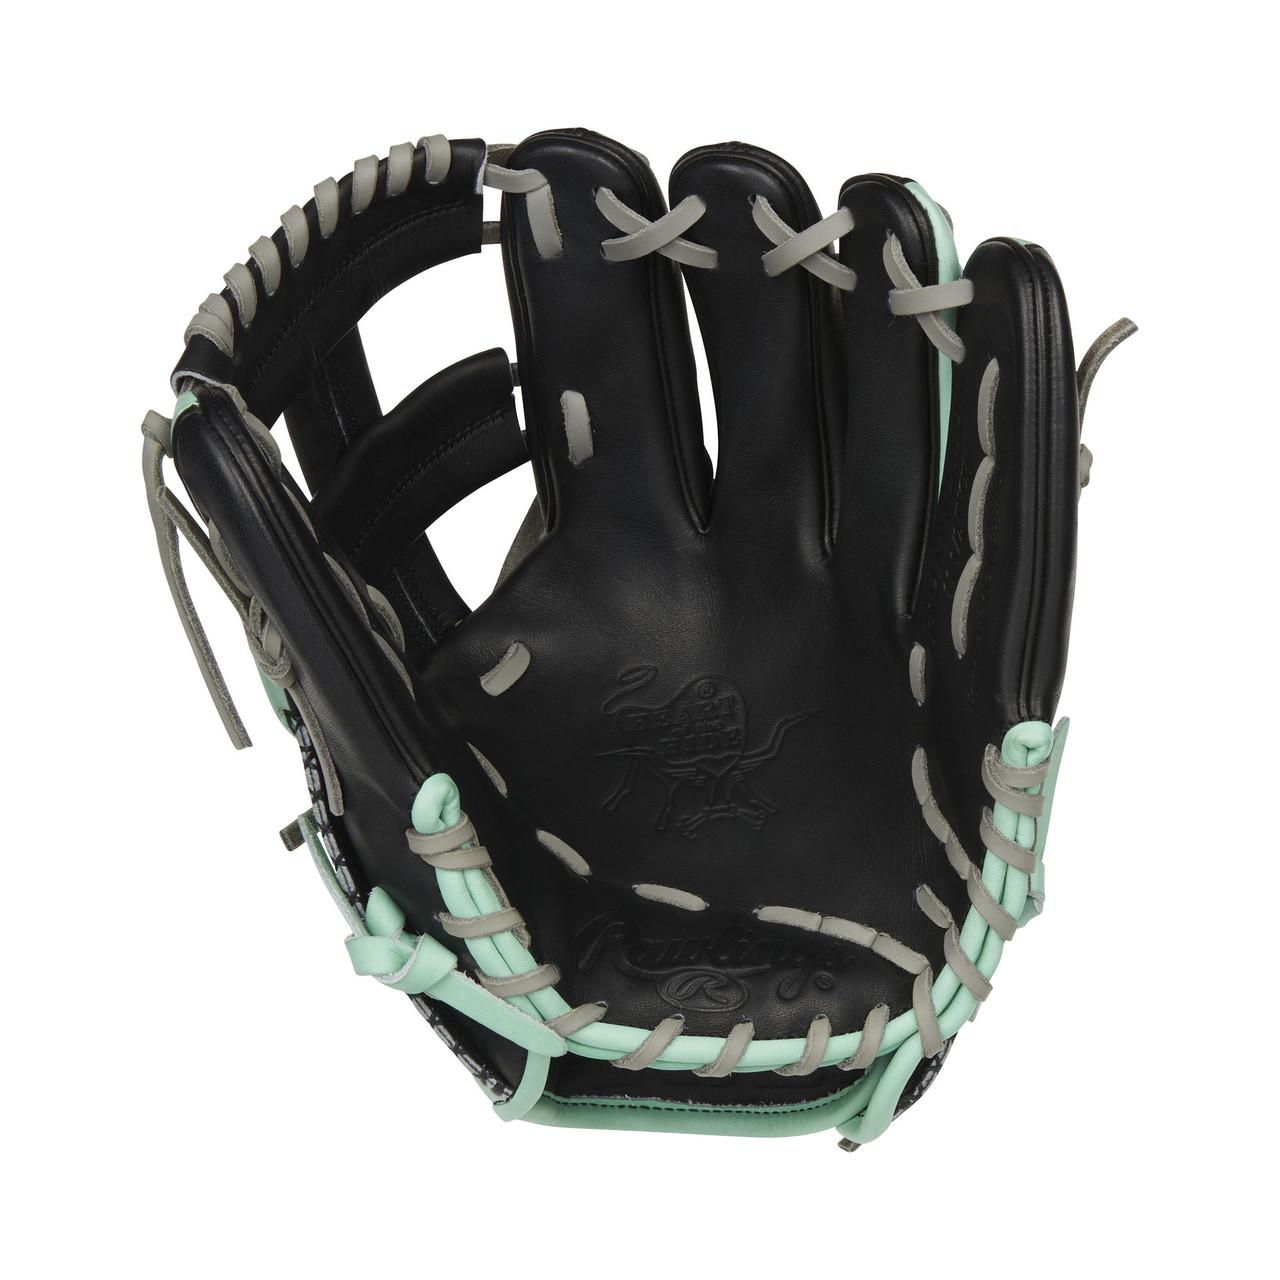 Rawlings Heart of the Hide ColorSync 5.0 11.5 Inch PRONP4-20BOM Baseball Glove